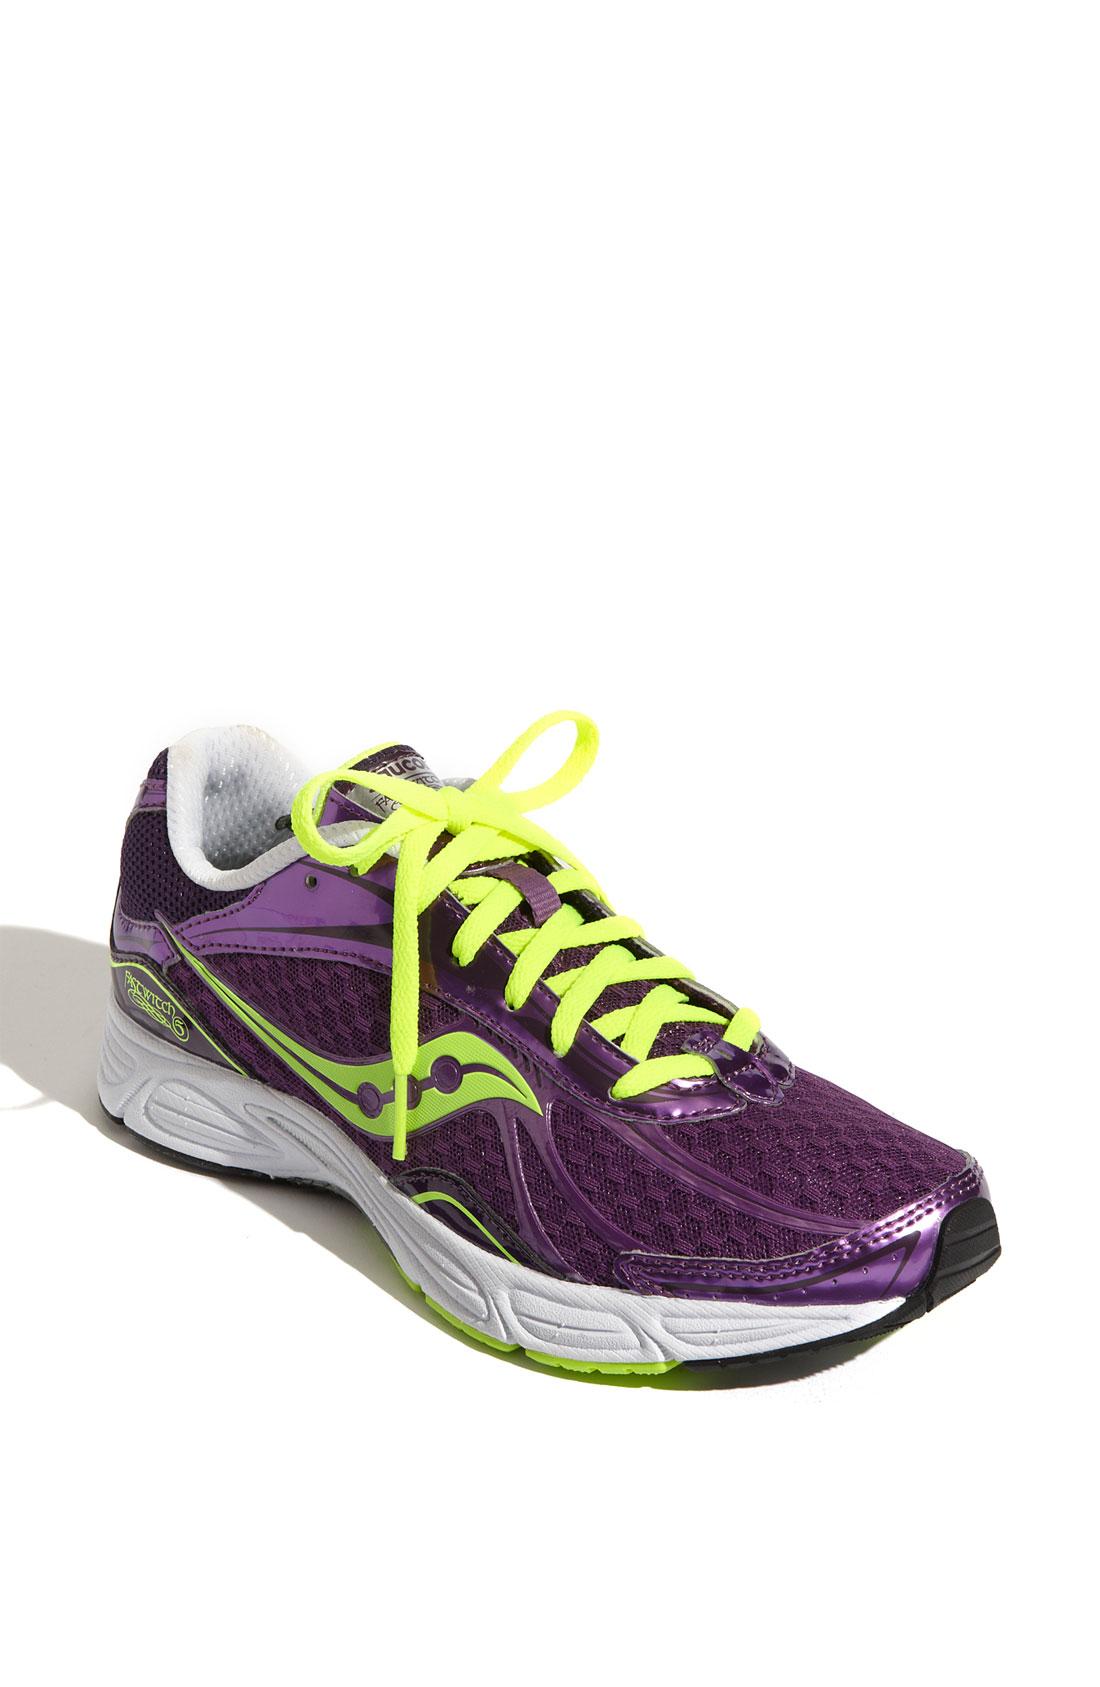 Saucony Womens Purple Training Shoes